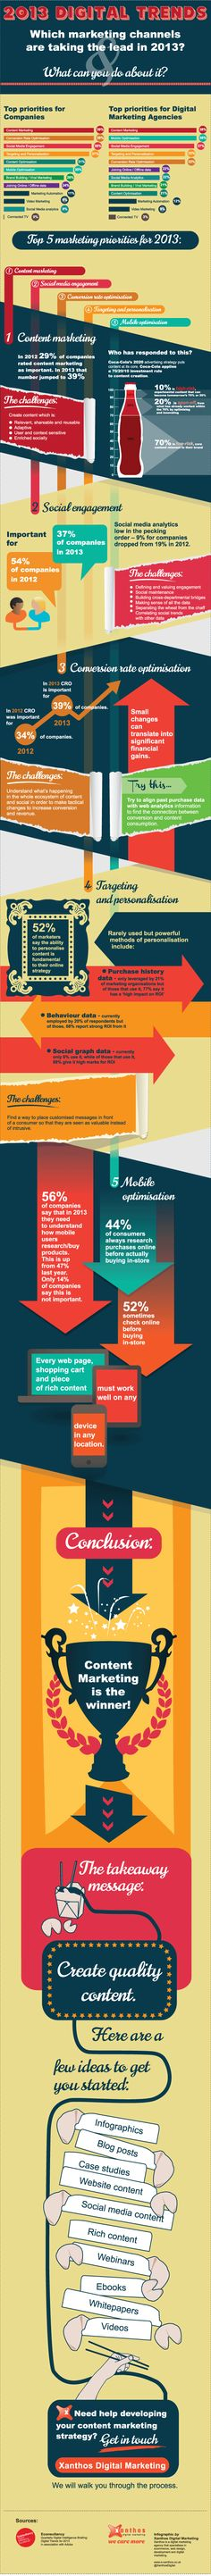 2013 Digital Trends #Infographic